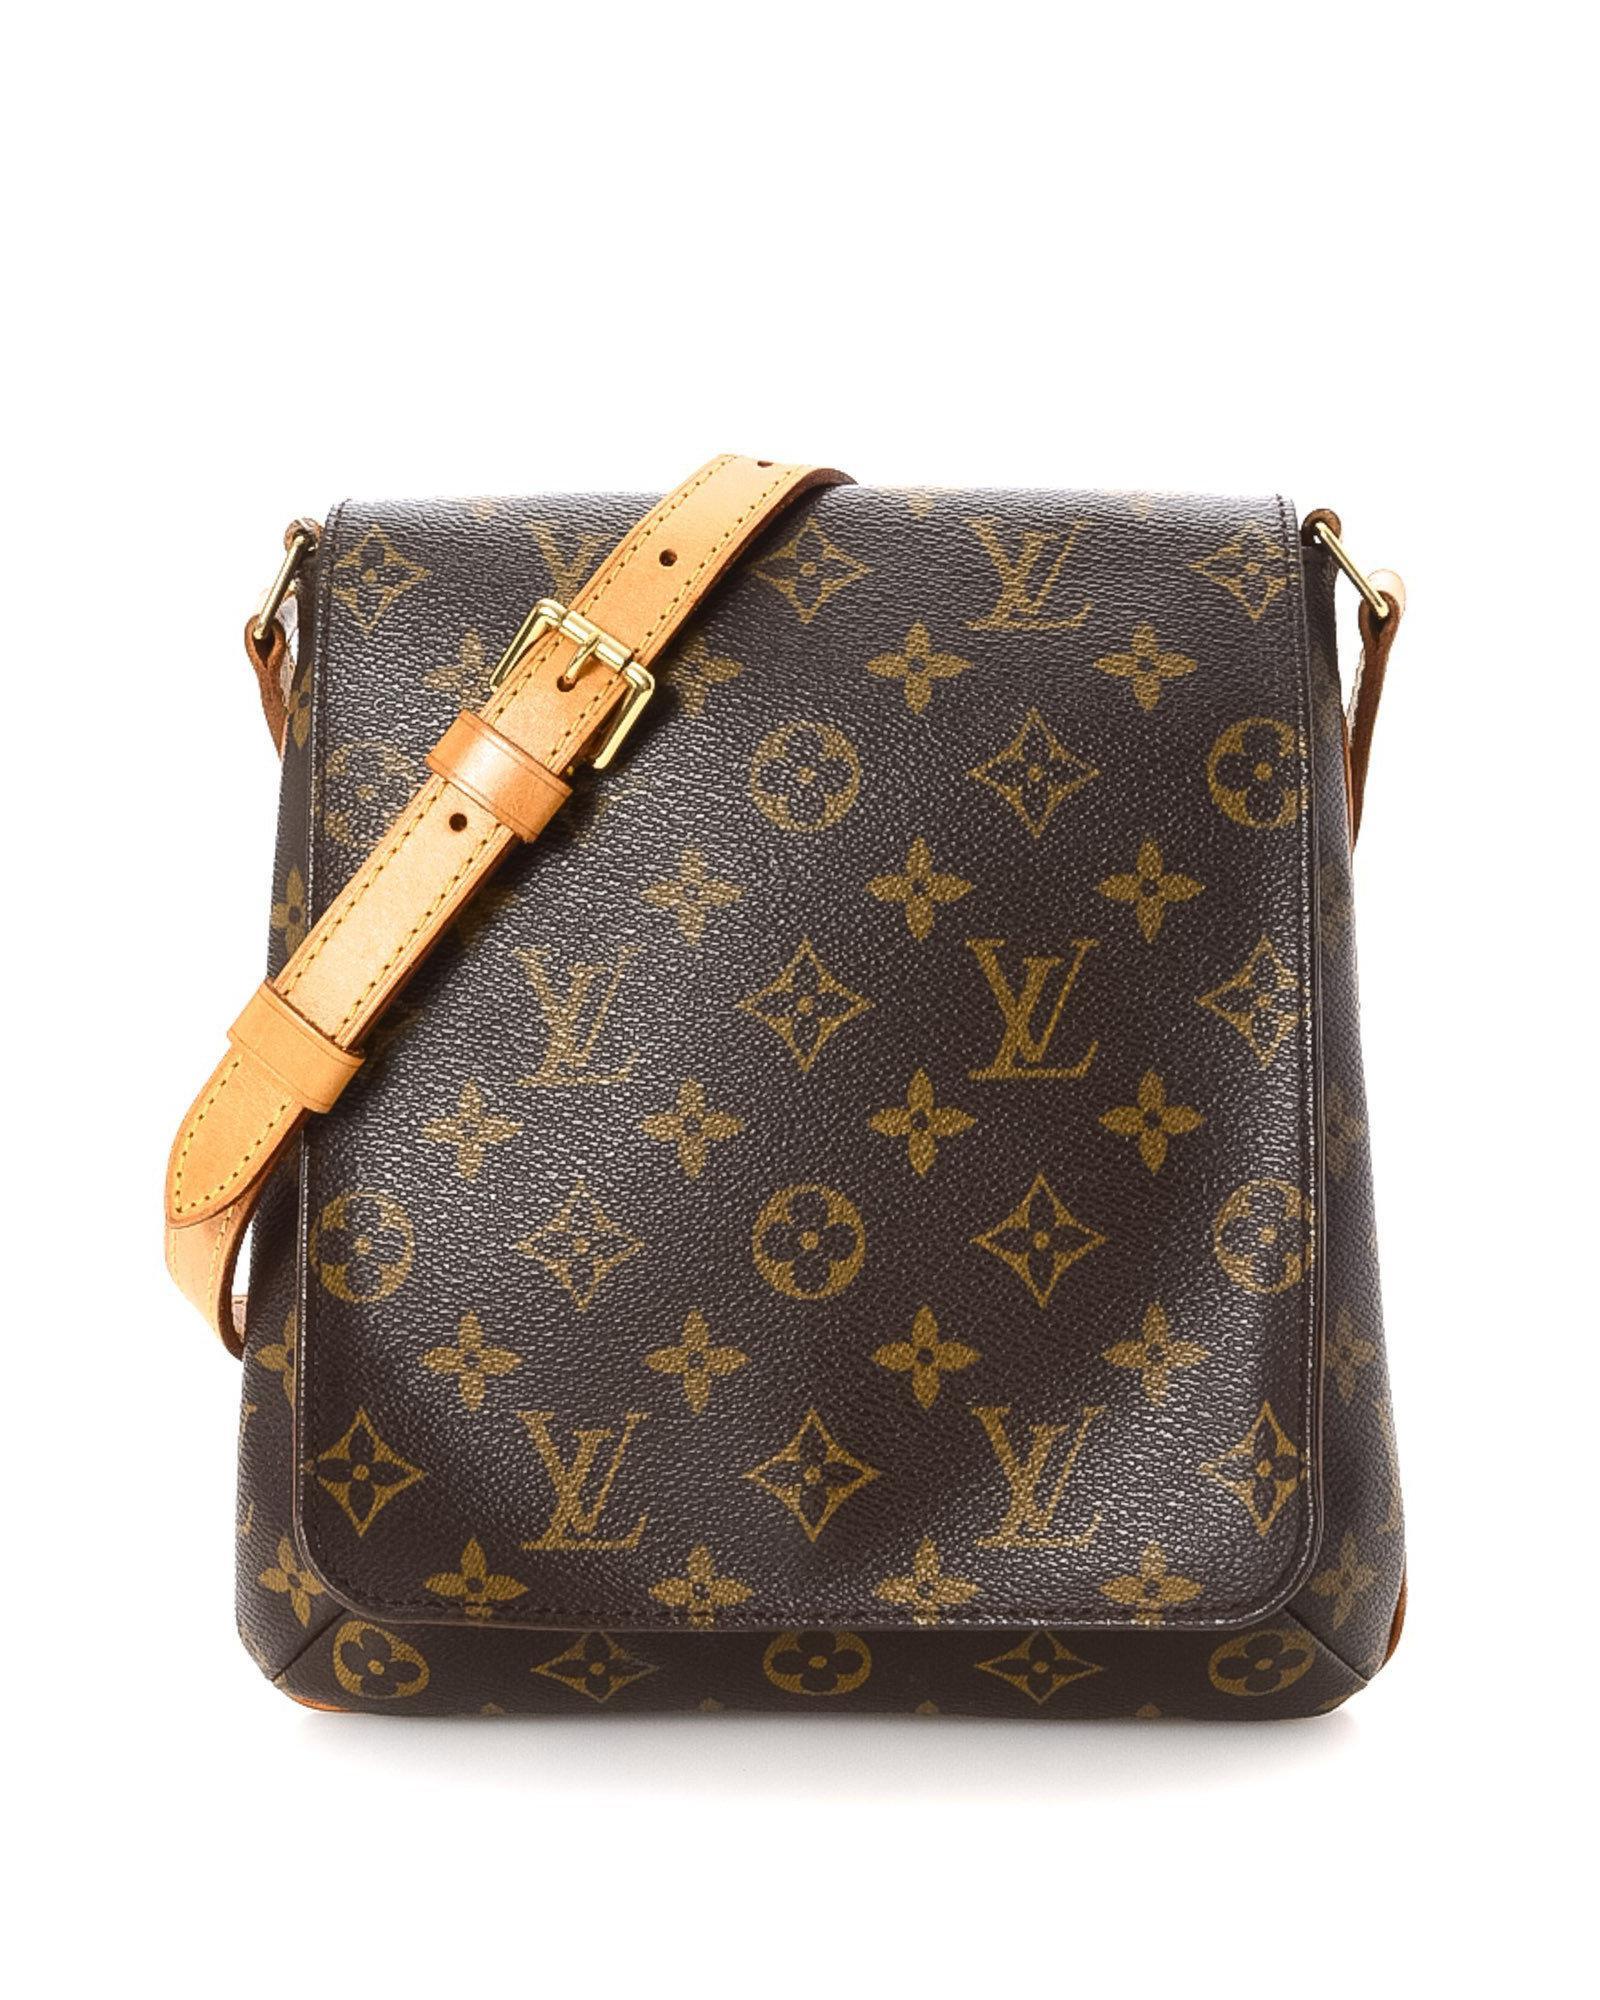 8ece0a2adf1e Lyst - Louis Vuitton Monogram Musette Salsa Long Strap Crossbody Bag ...